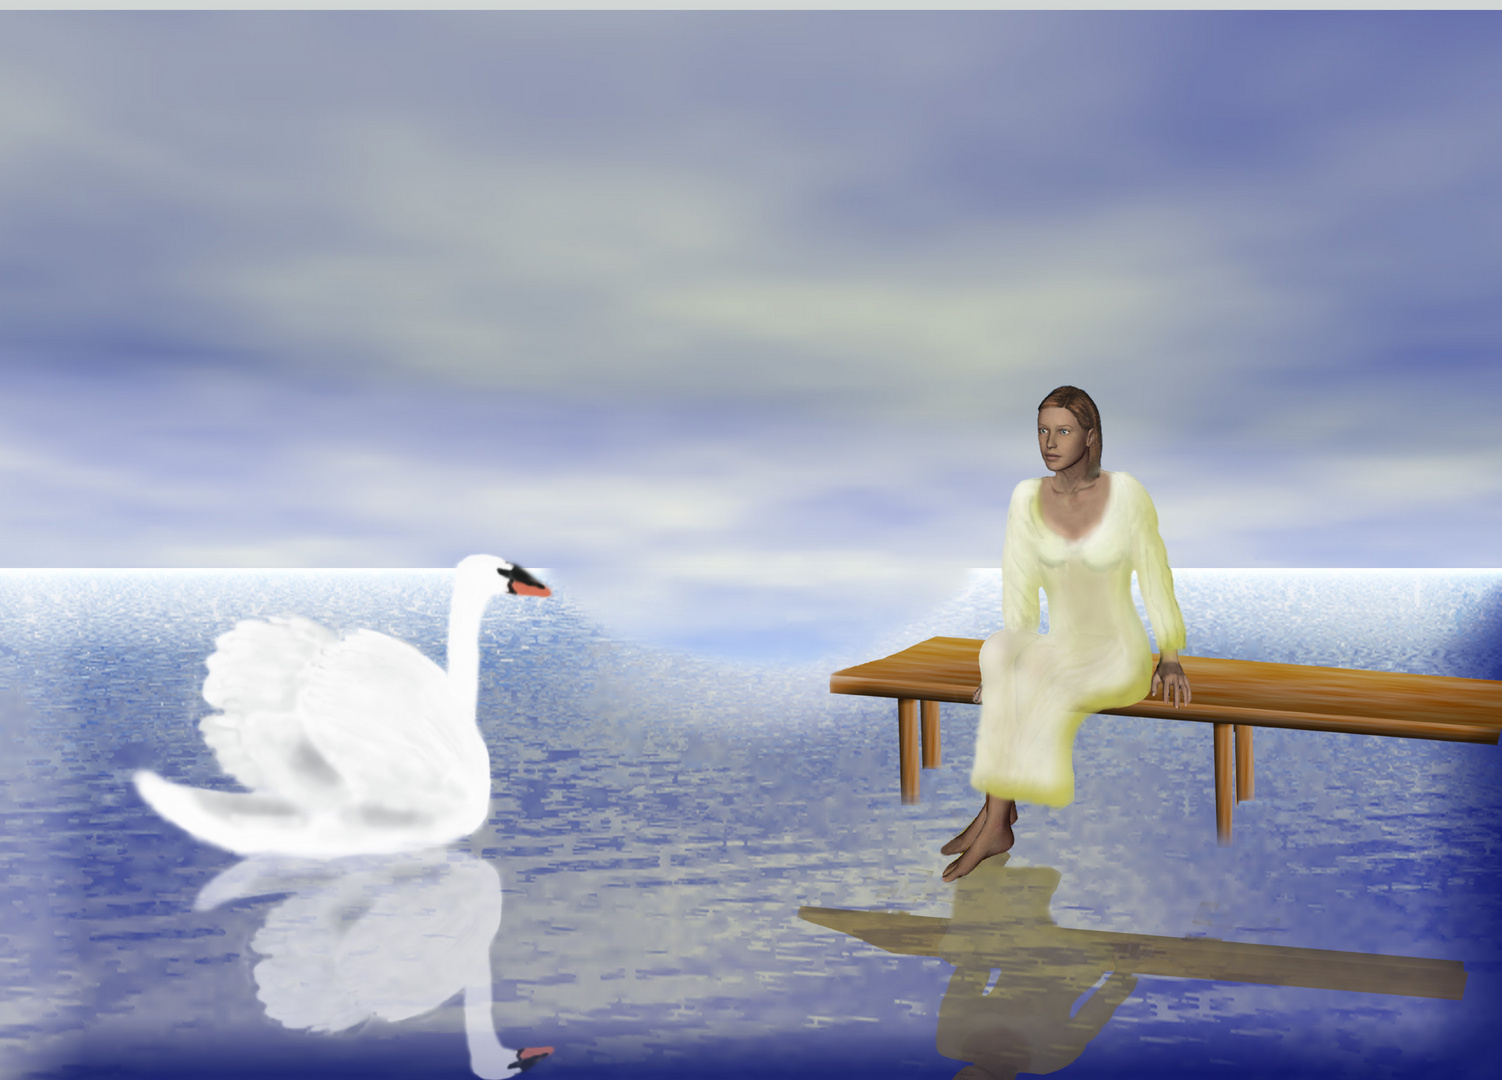 Frau und Schwan die 2